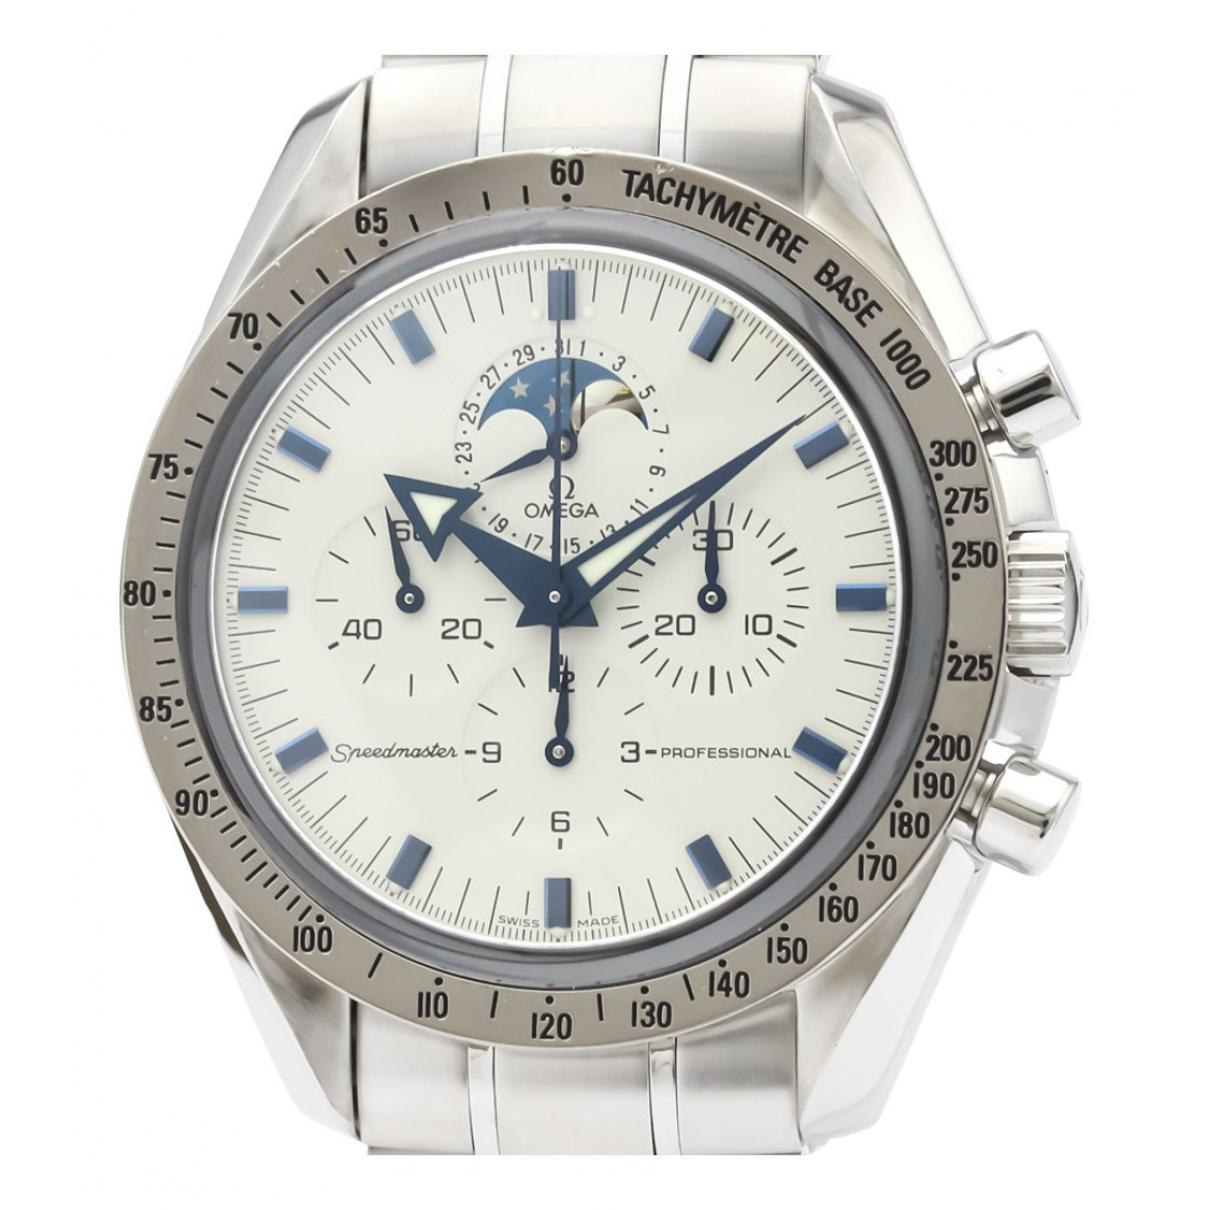 Relojes Speedmaster de Plata Omega